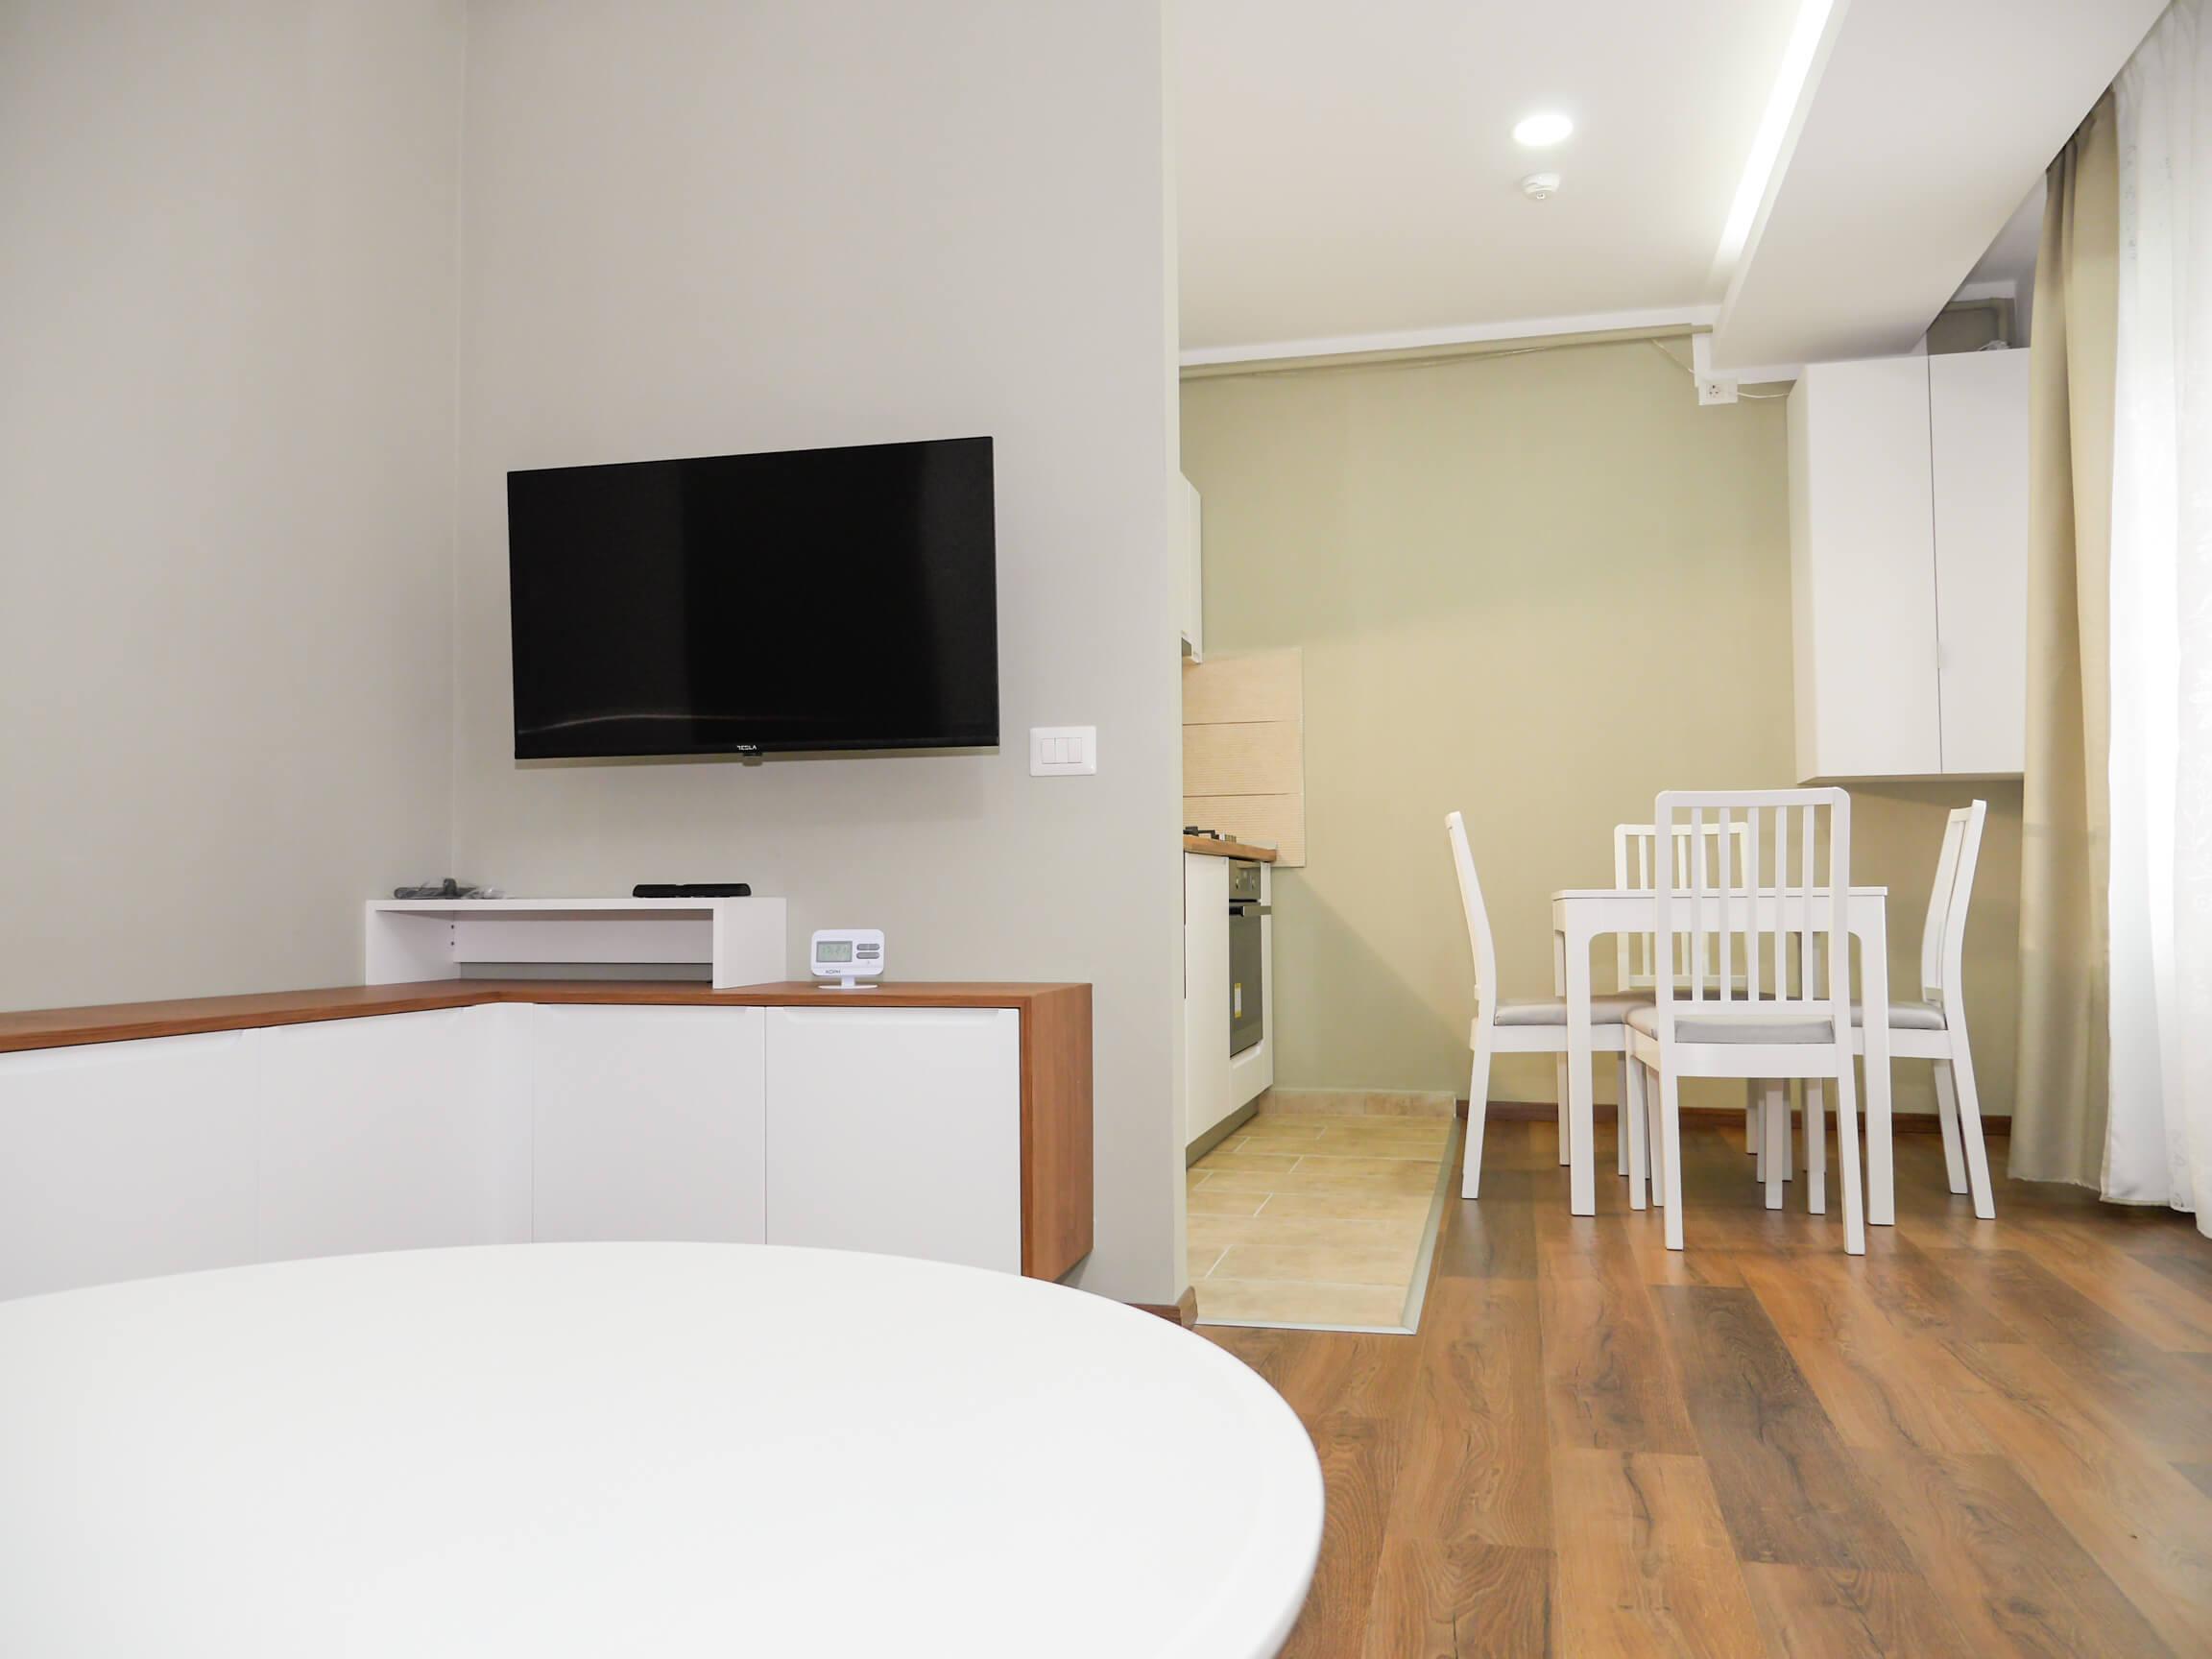 Clement Apartments - apartamente de inchiriat in regim hotelier - cazare neamt - cazare piatra neamt (4)